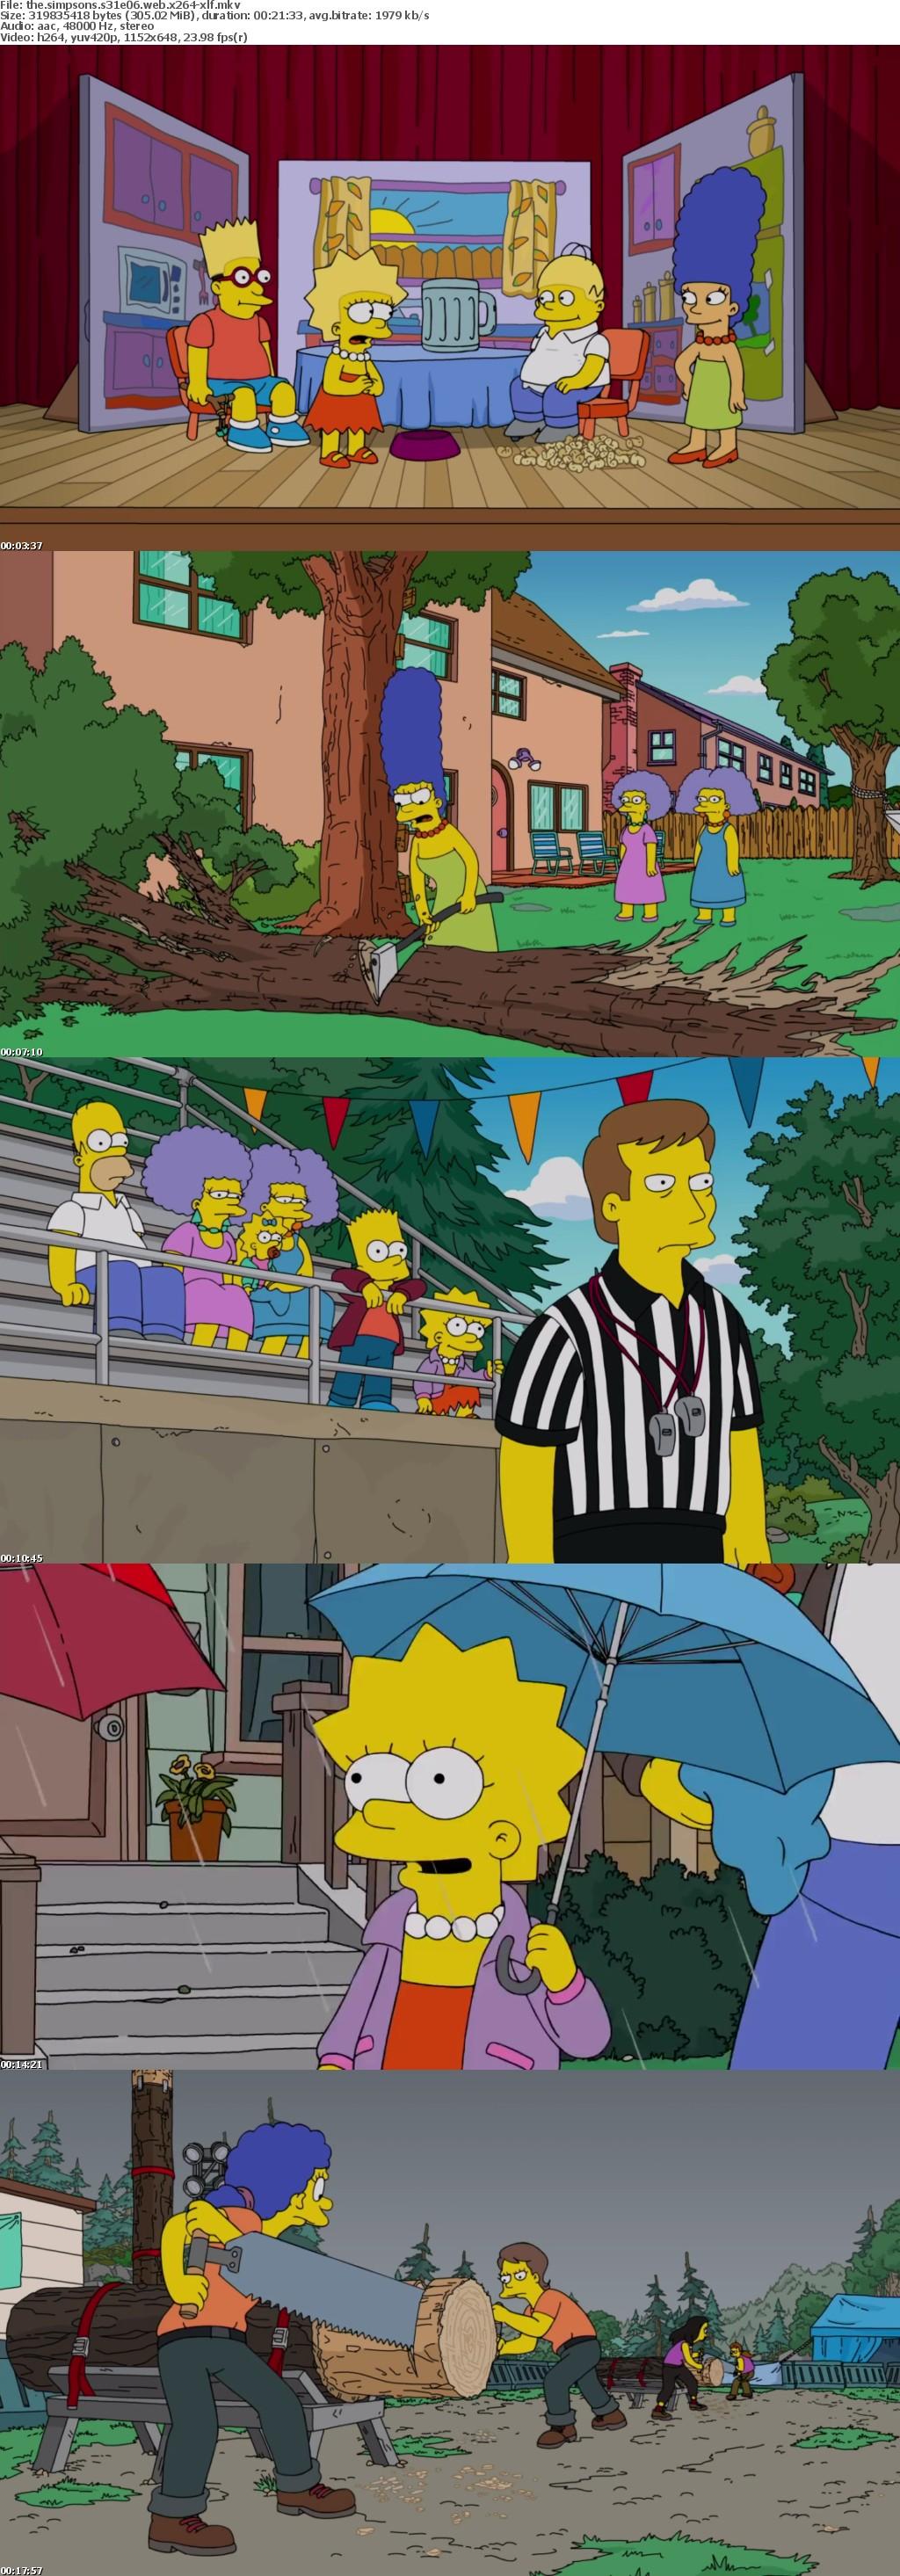 The Simpsons S31E06 WEB x264-XLF